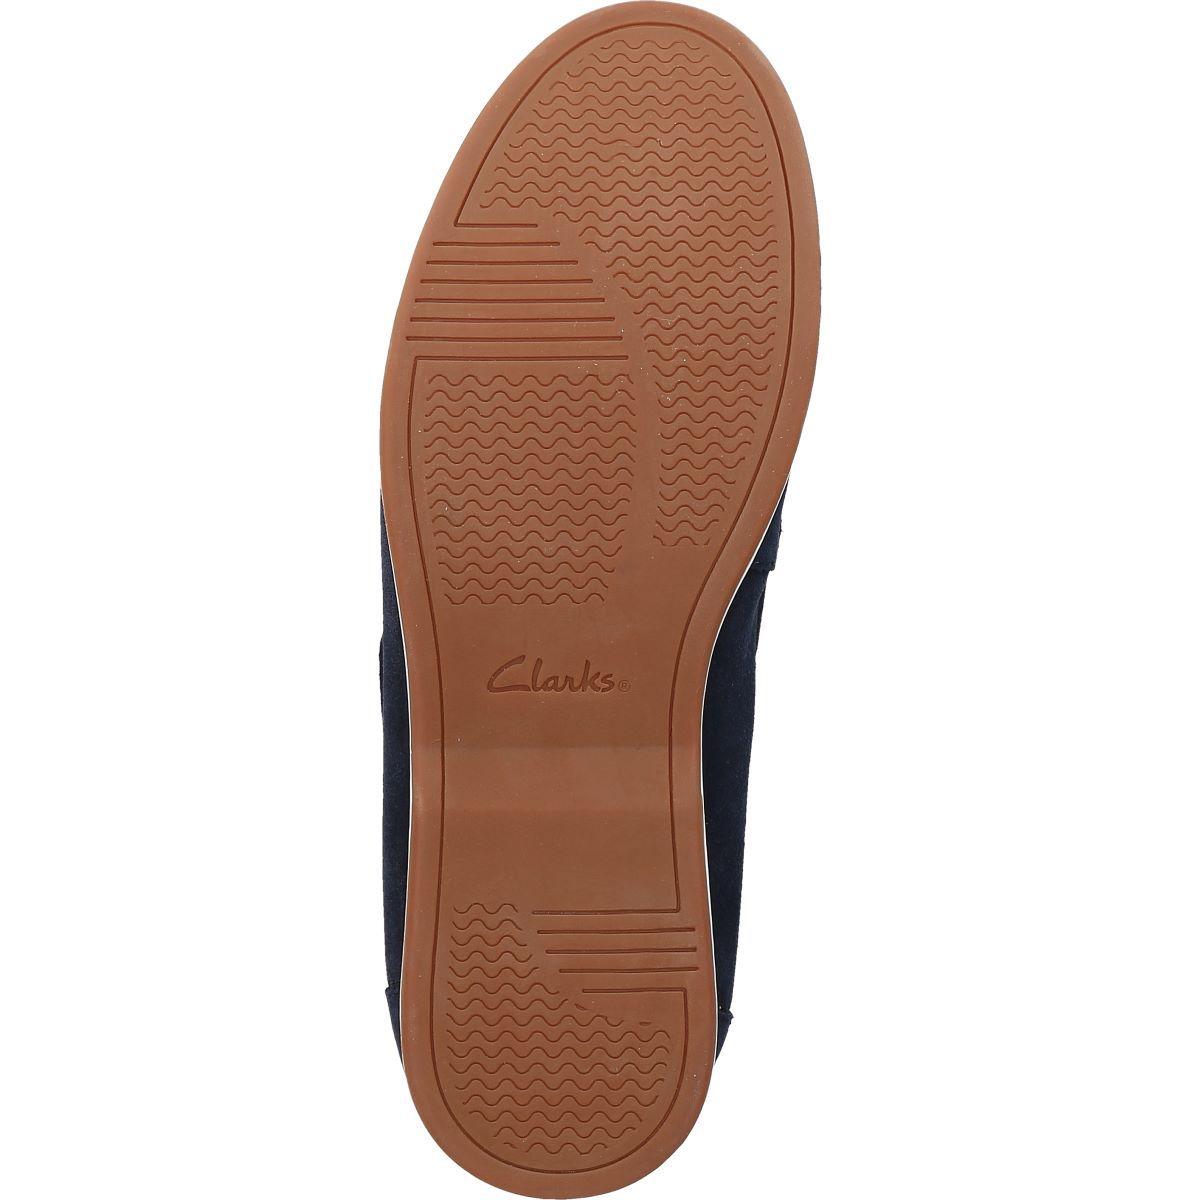 Clarks Morven Sun 26142073 7 Men's shoes Loafers buy shoes